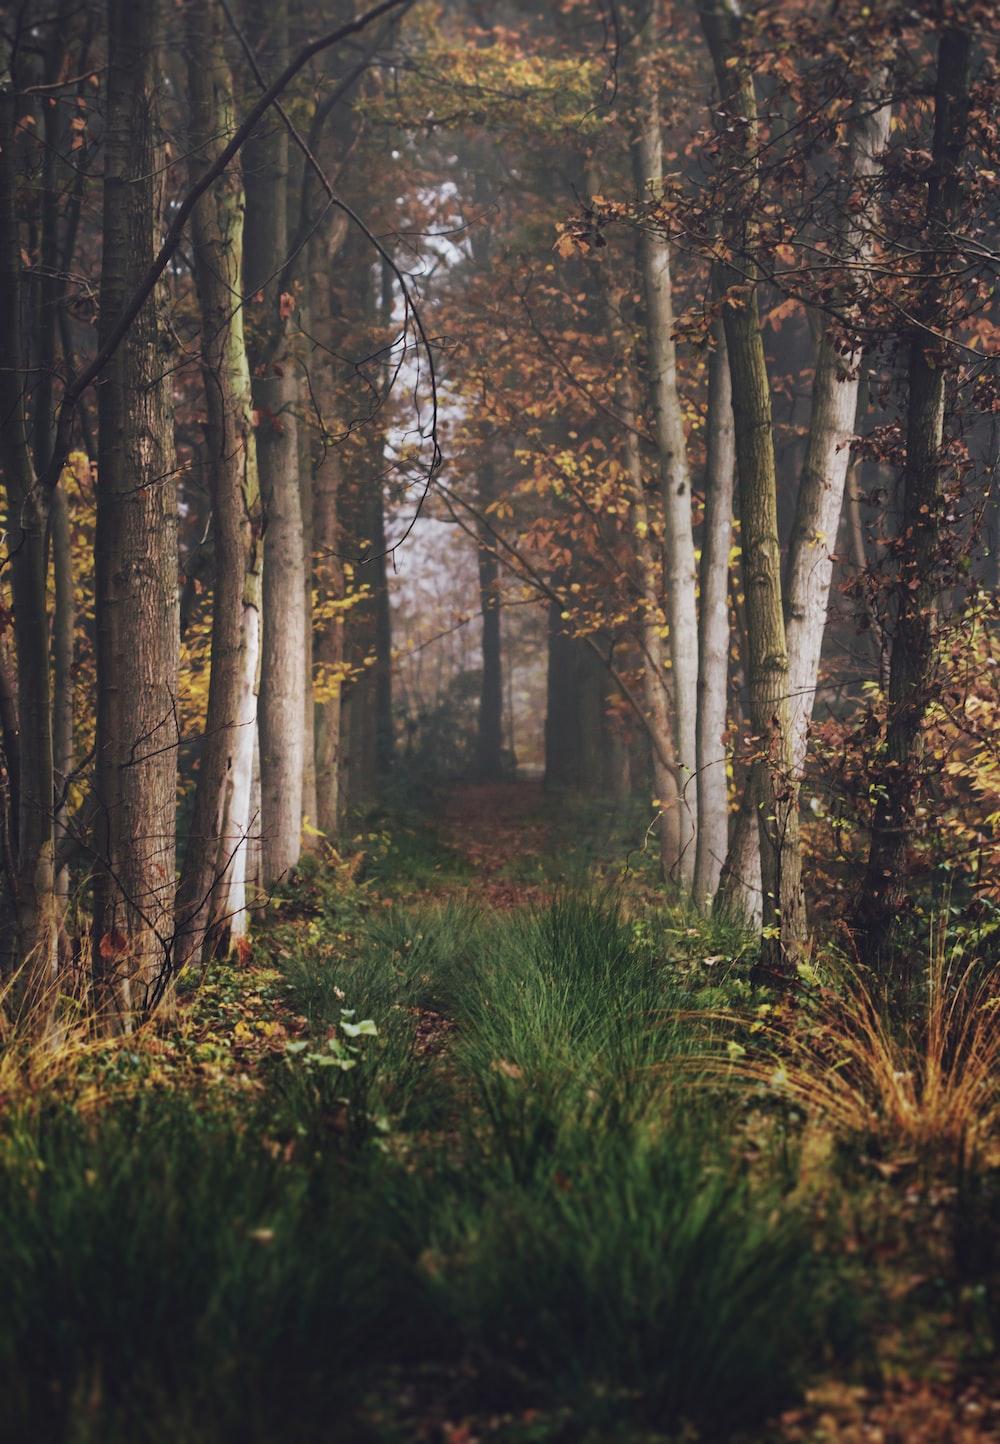 pathway between brown trees during daytime